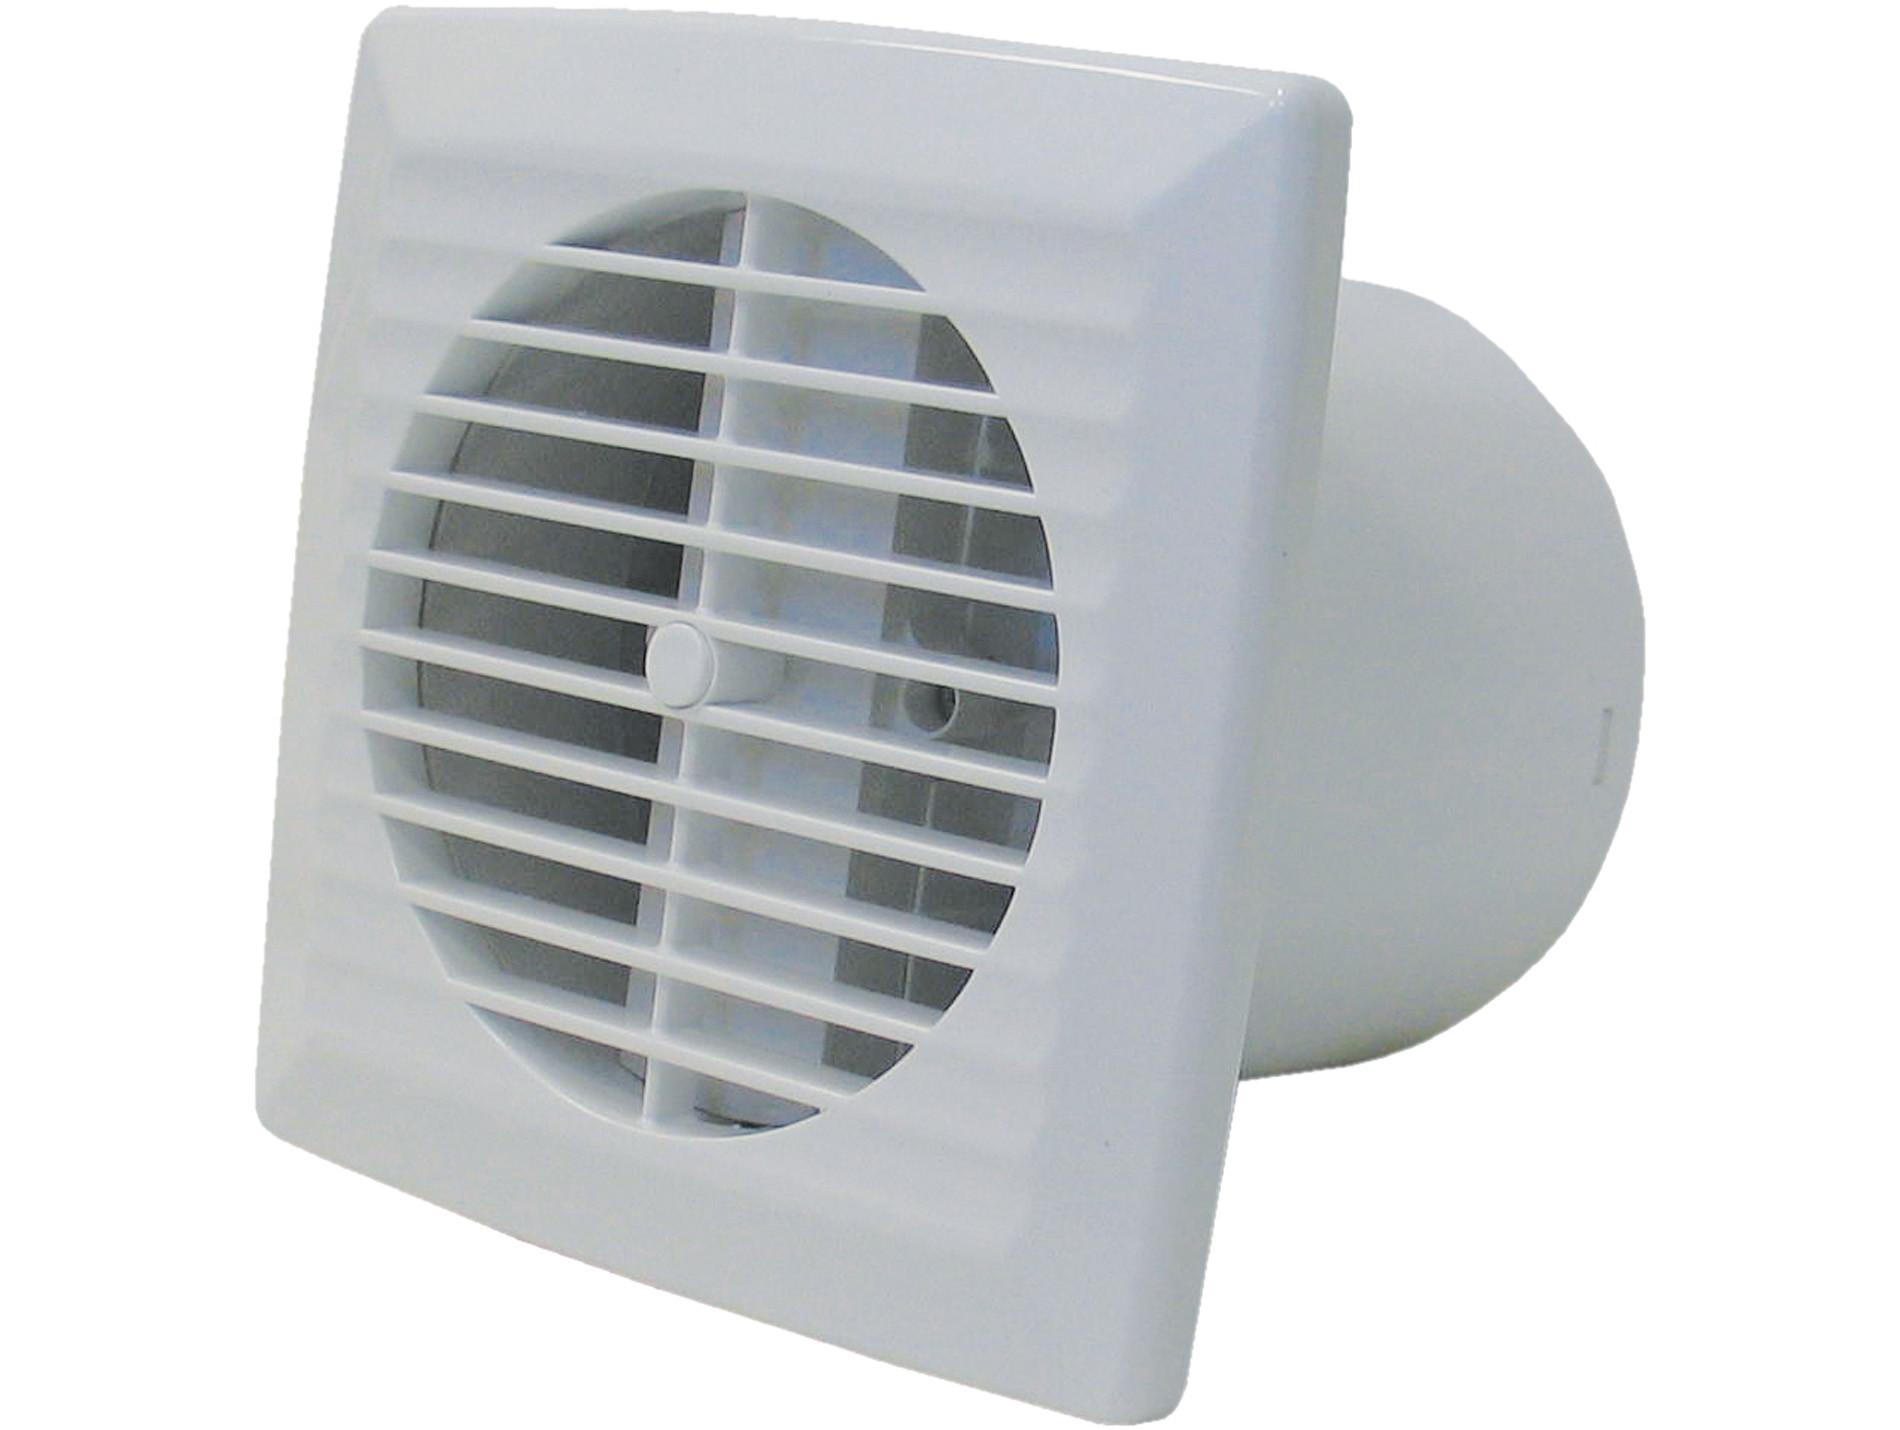 Extracteur façade extra plat standard Ventilation